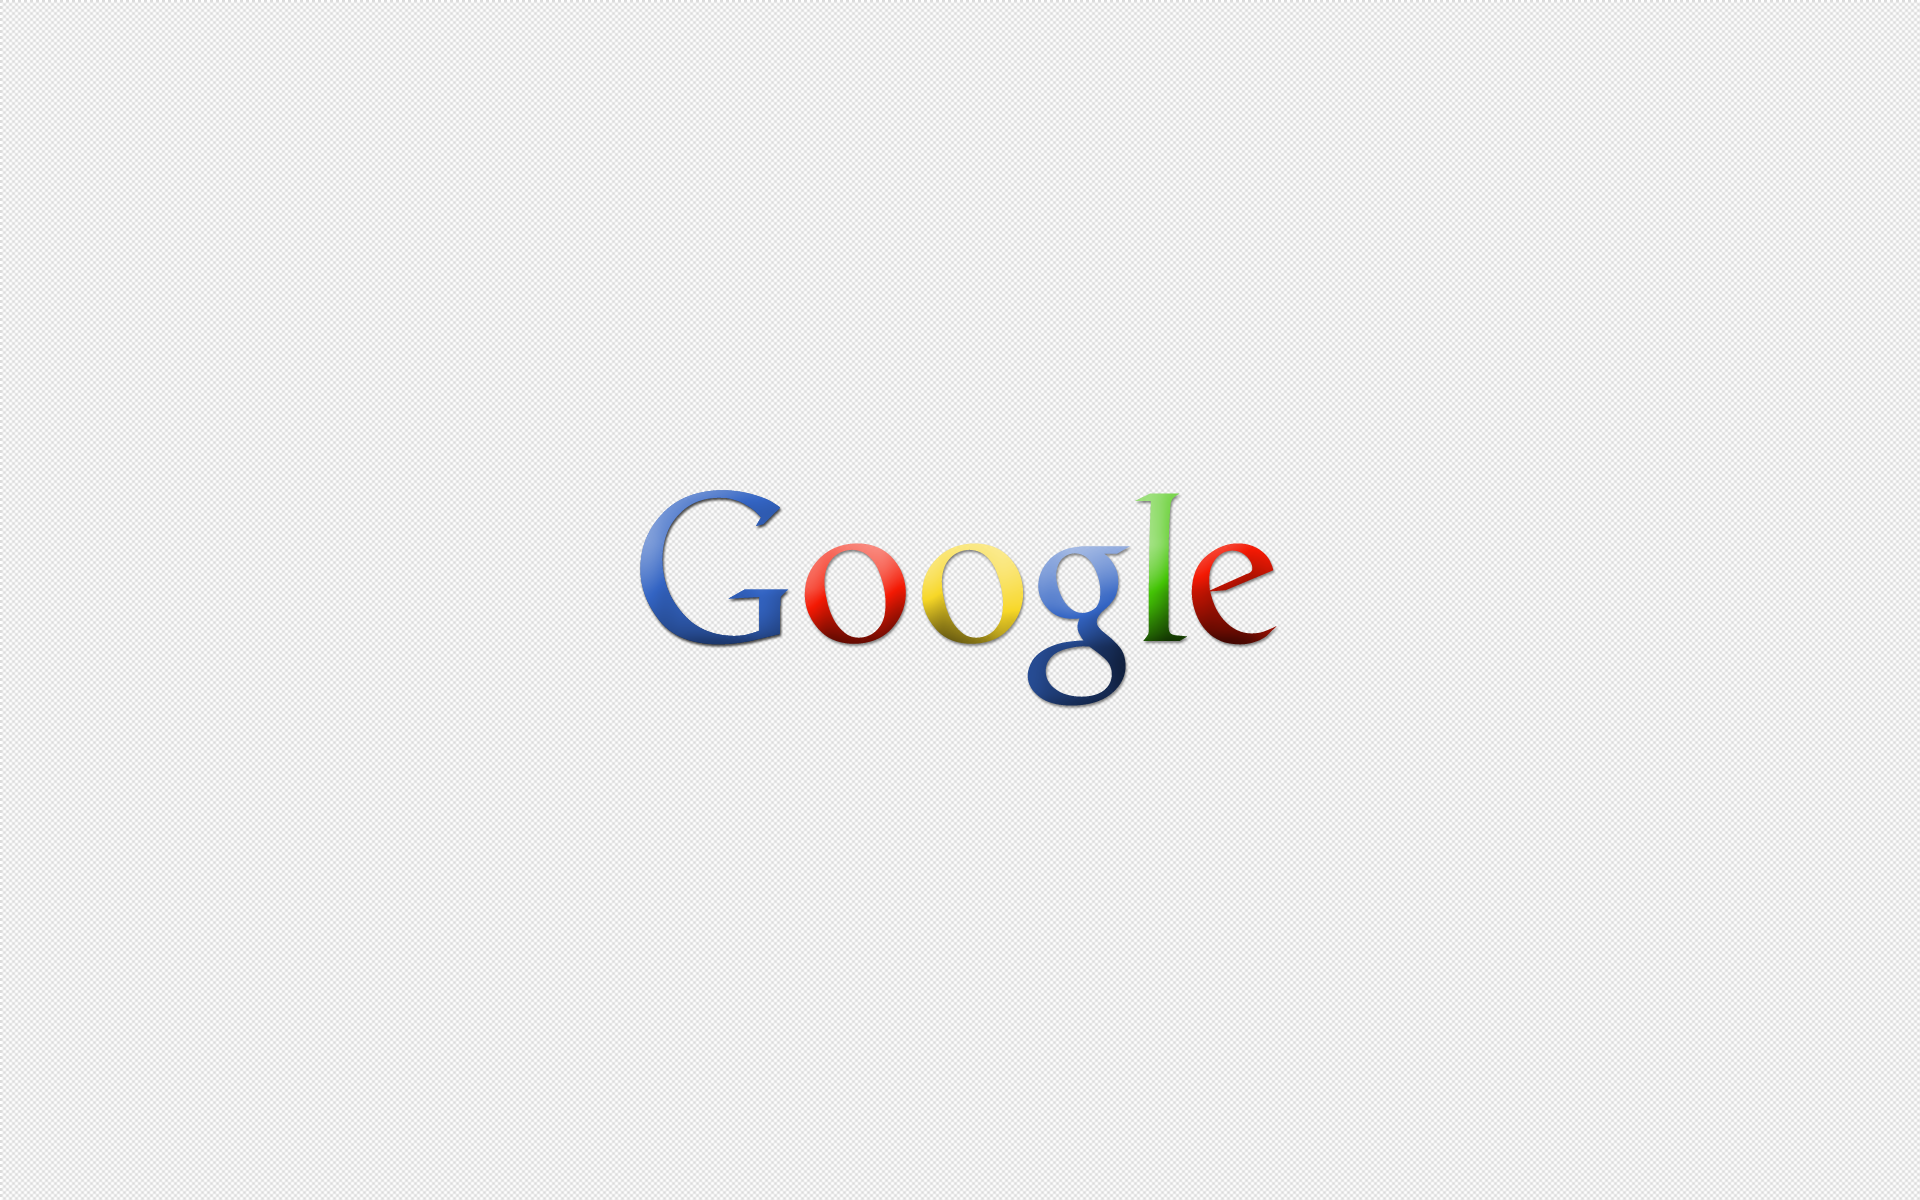 Google Wallpaper is a hi res Wallpaper for pc desktopslaptops 1920x1200